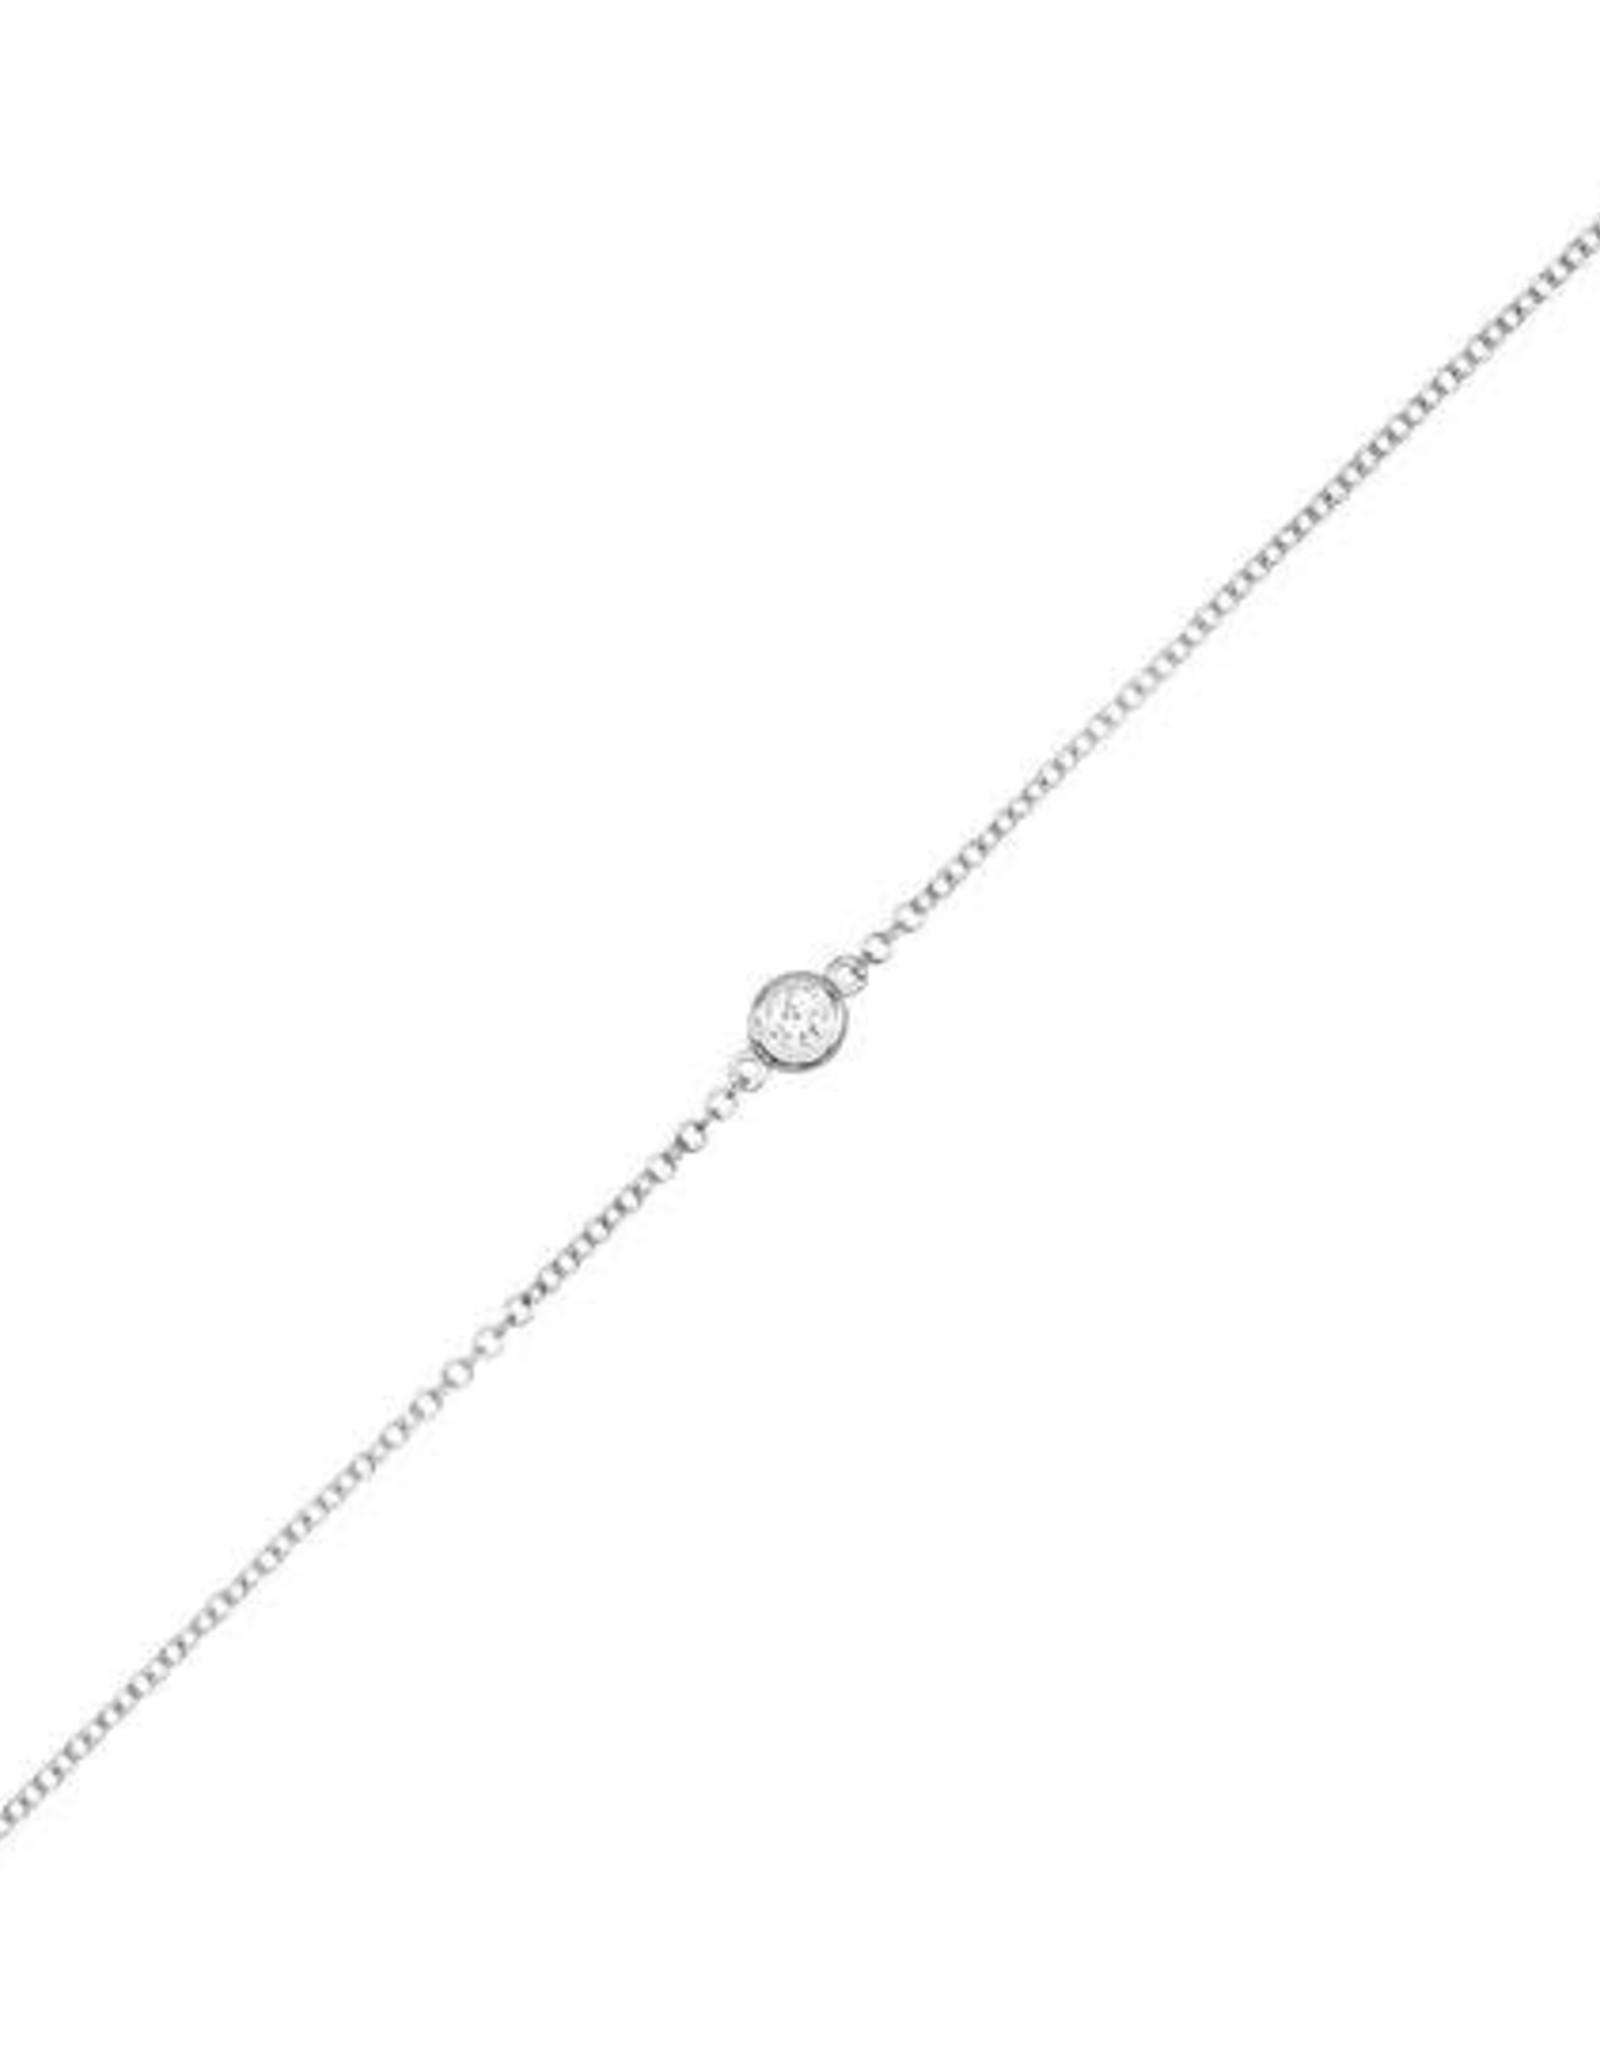 Adinas Diamond Bezel Bracelet 14K